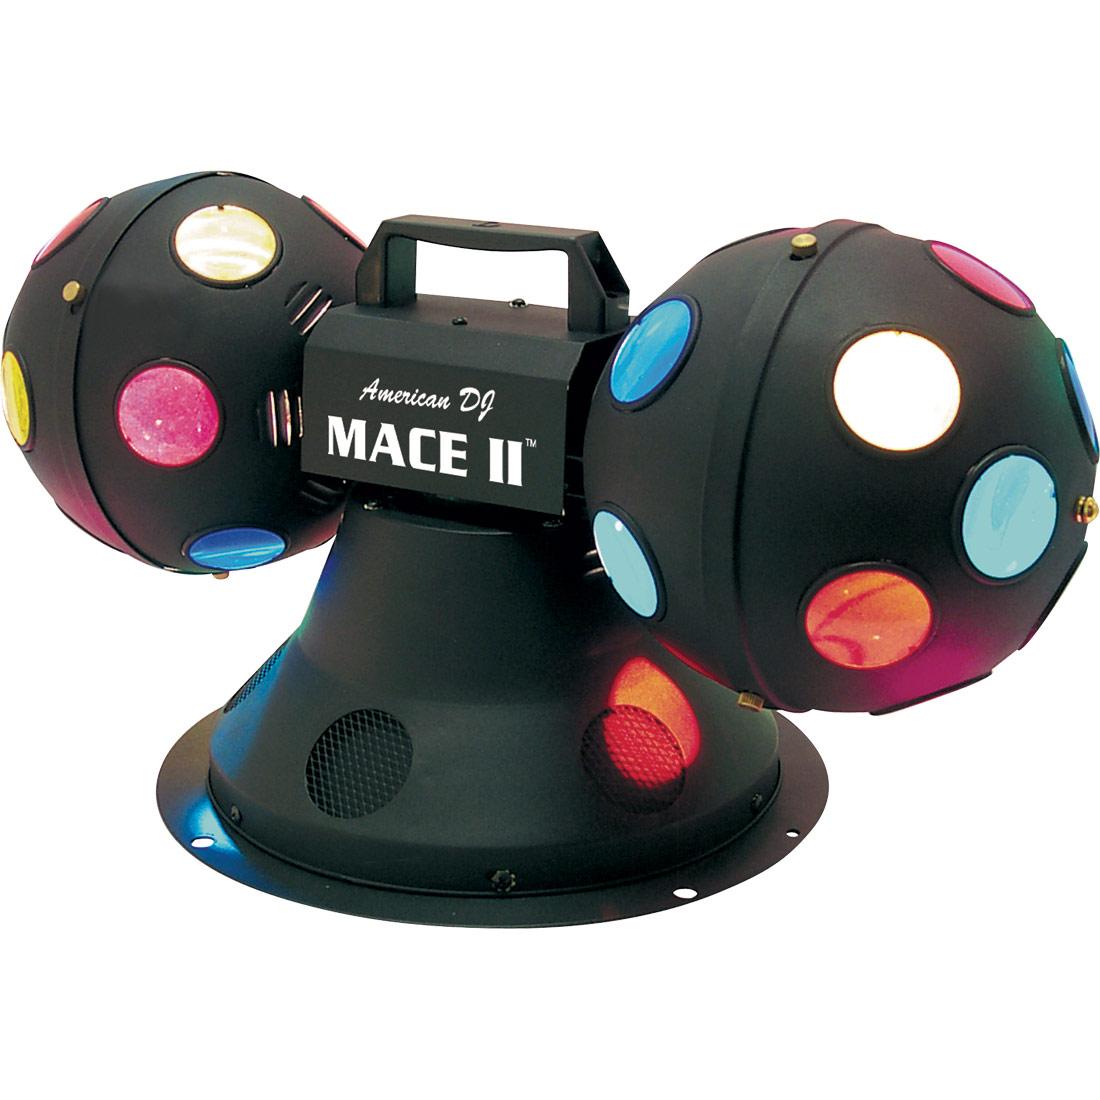 Mace II